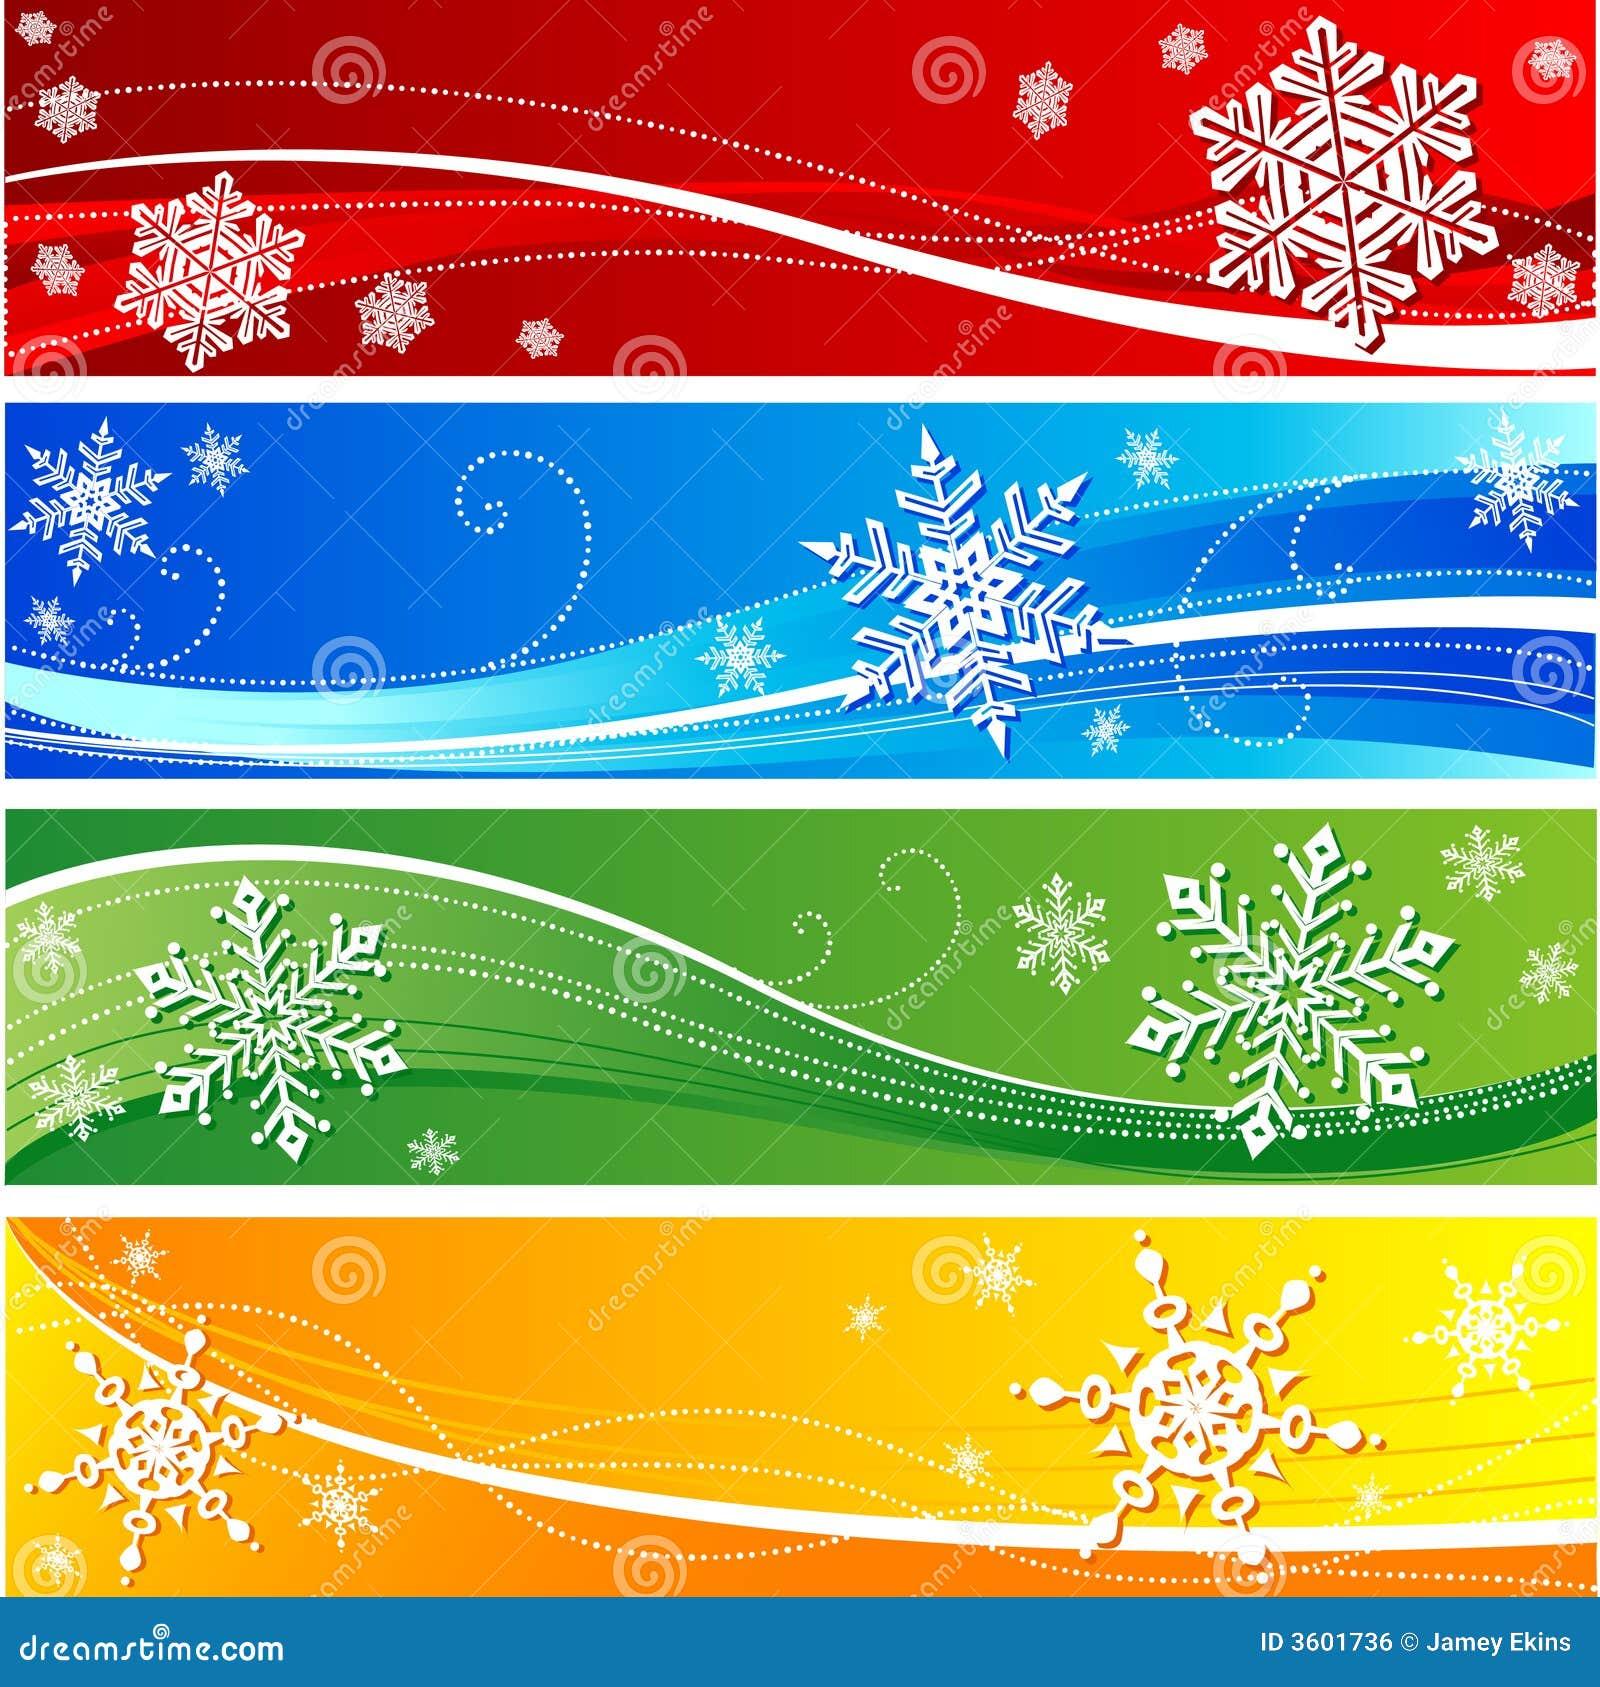 winter snowflake banner royalty free stock image